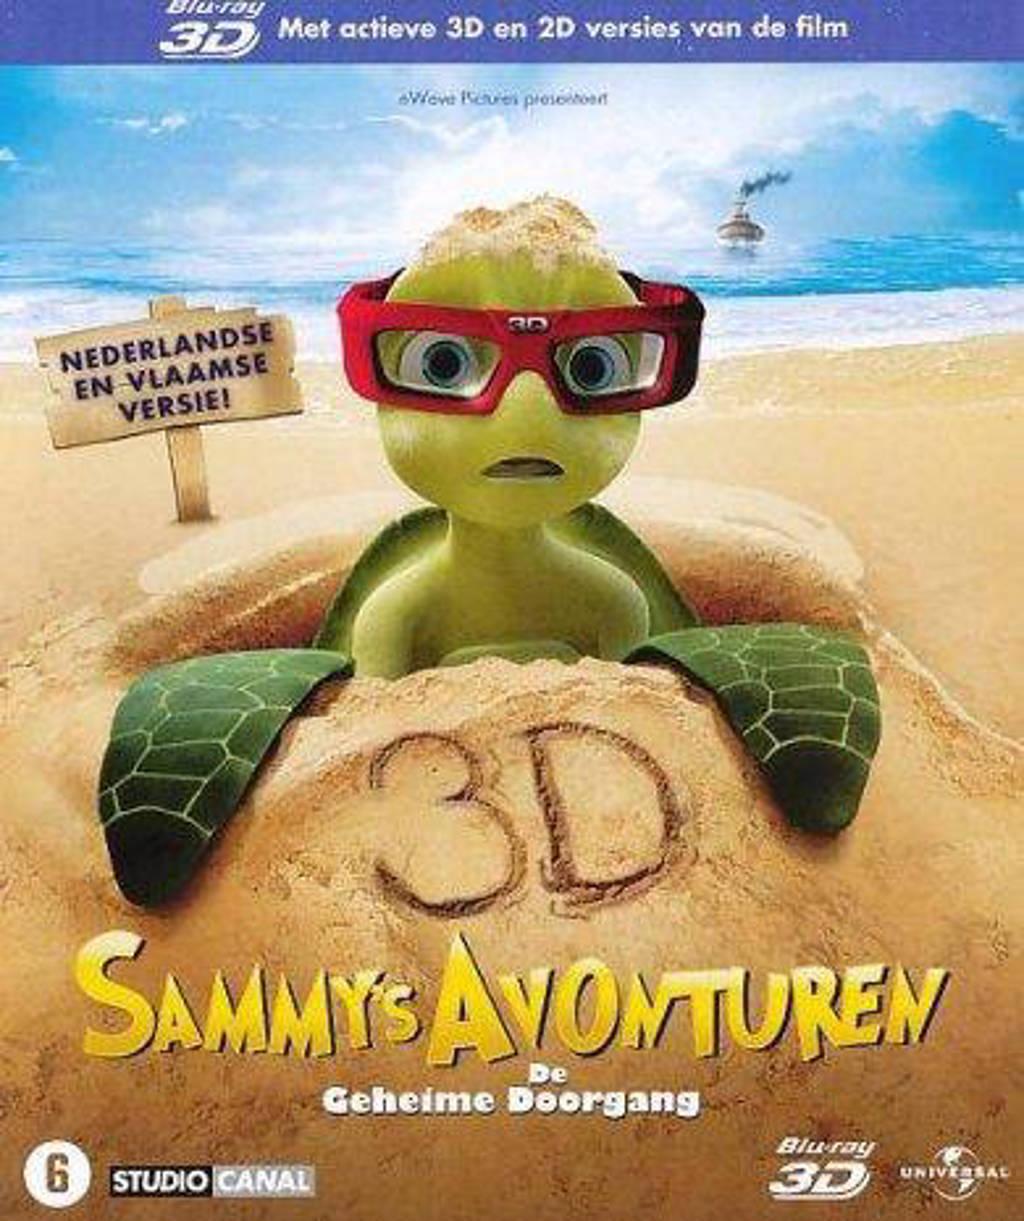 Sammy's avonturen - De geheime doorgang (3D) (Blu-ray)